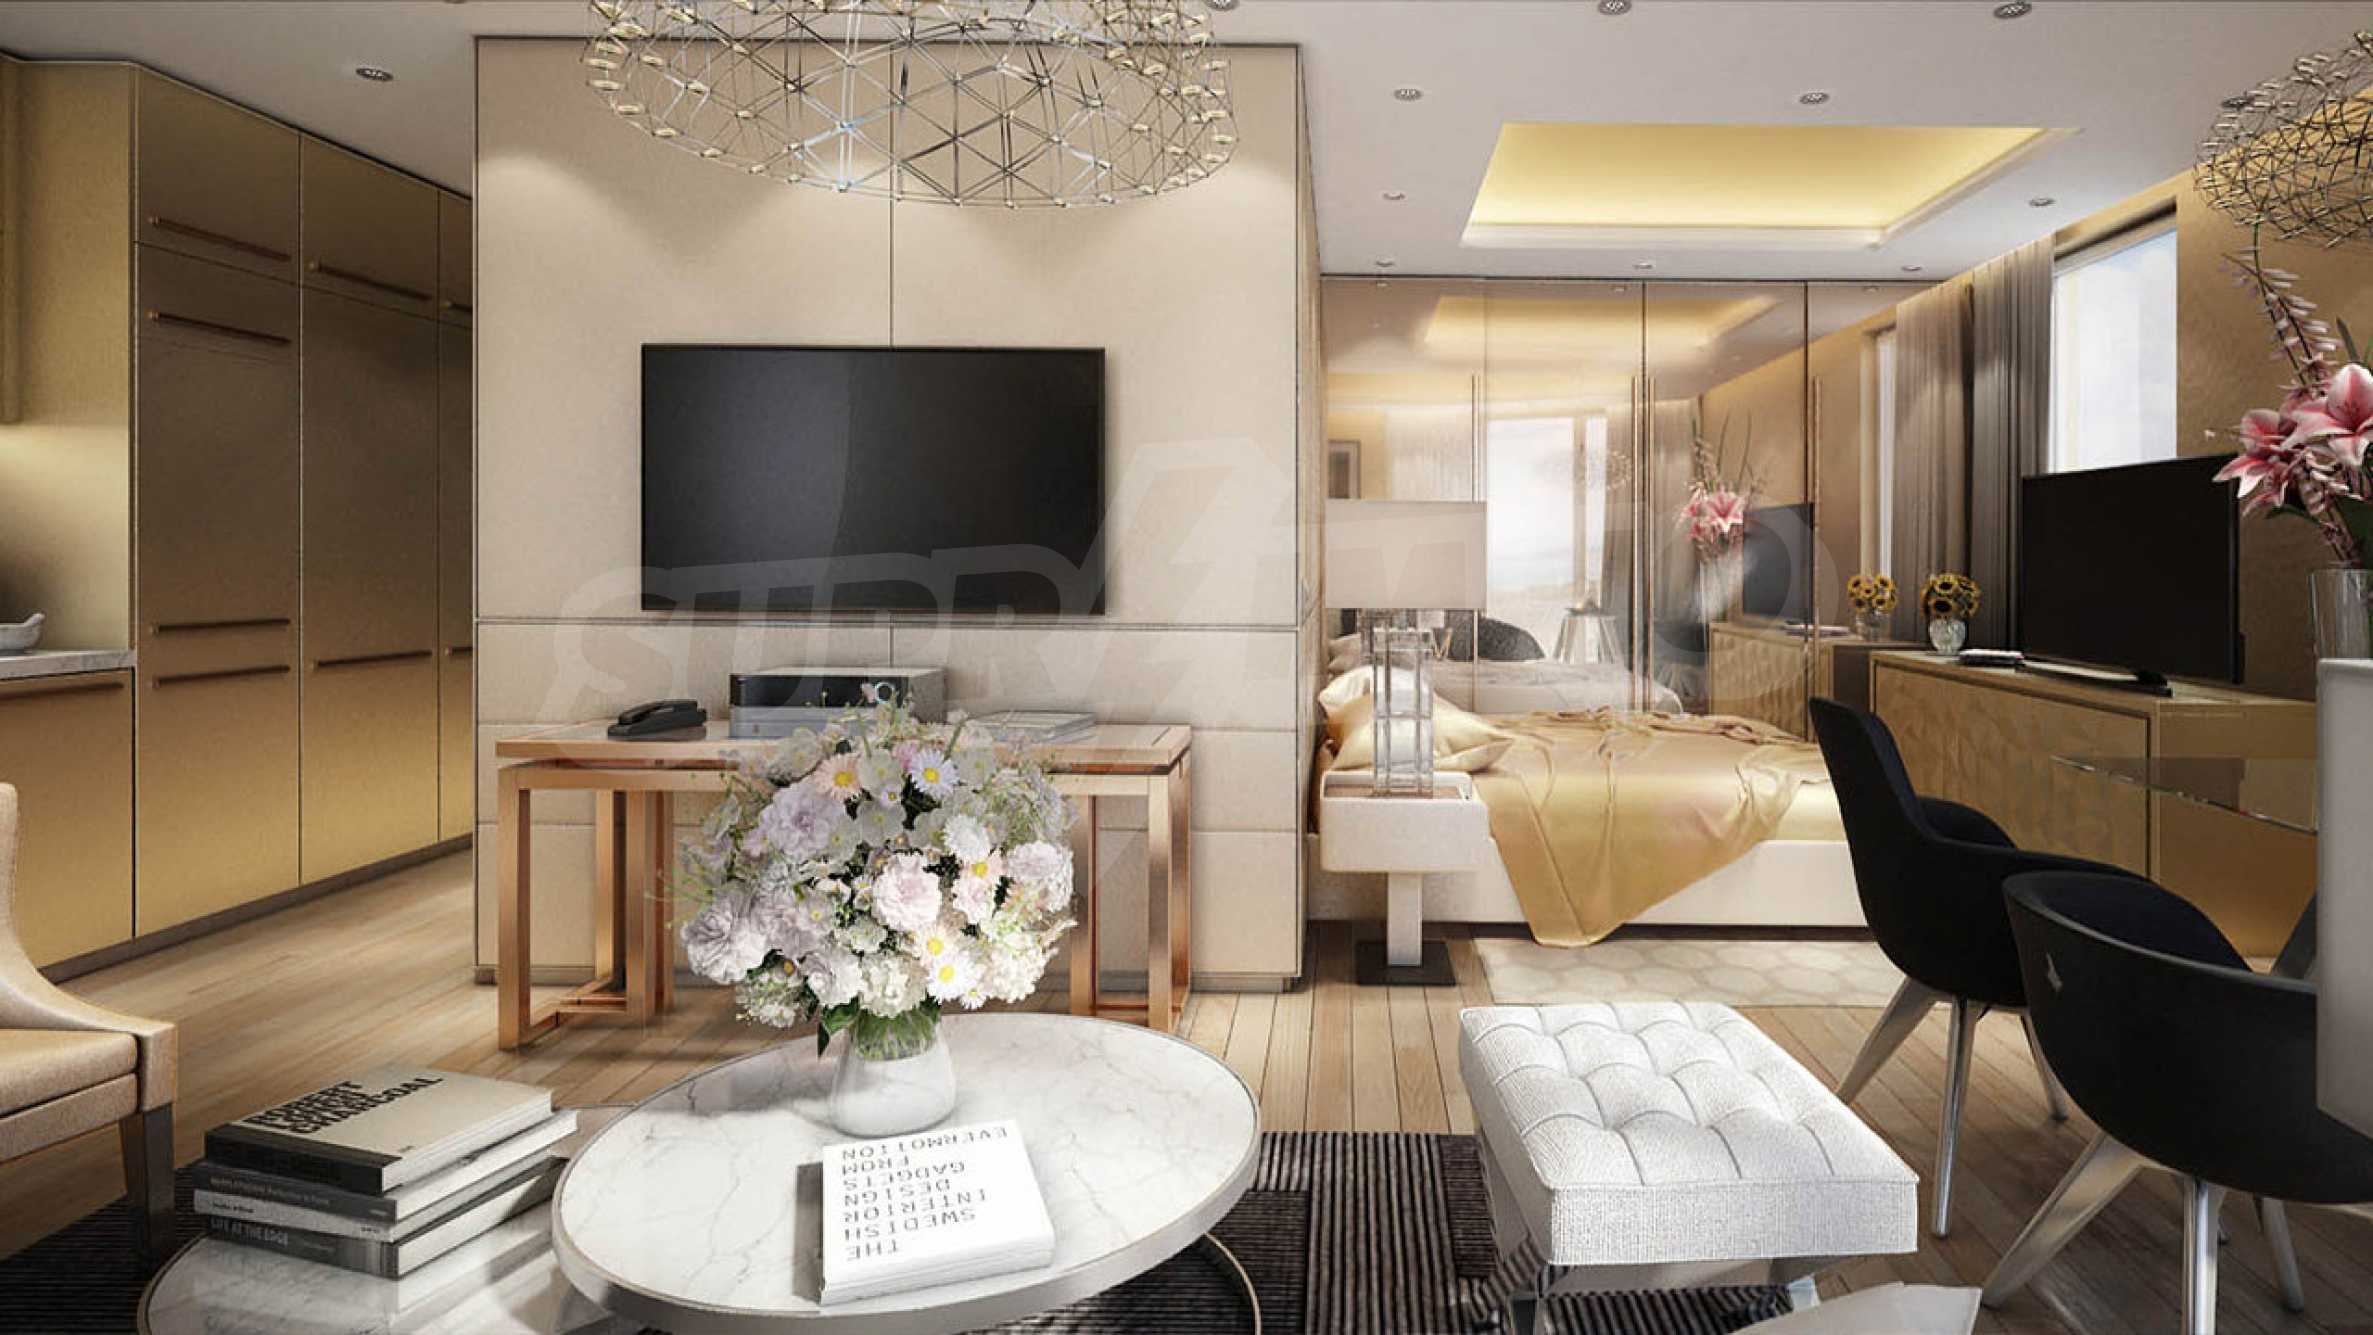 Нова сграда с луксозни апартаменти в гр. Бургас 13